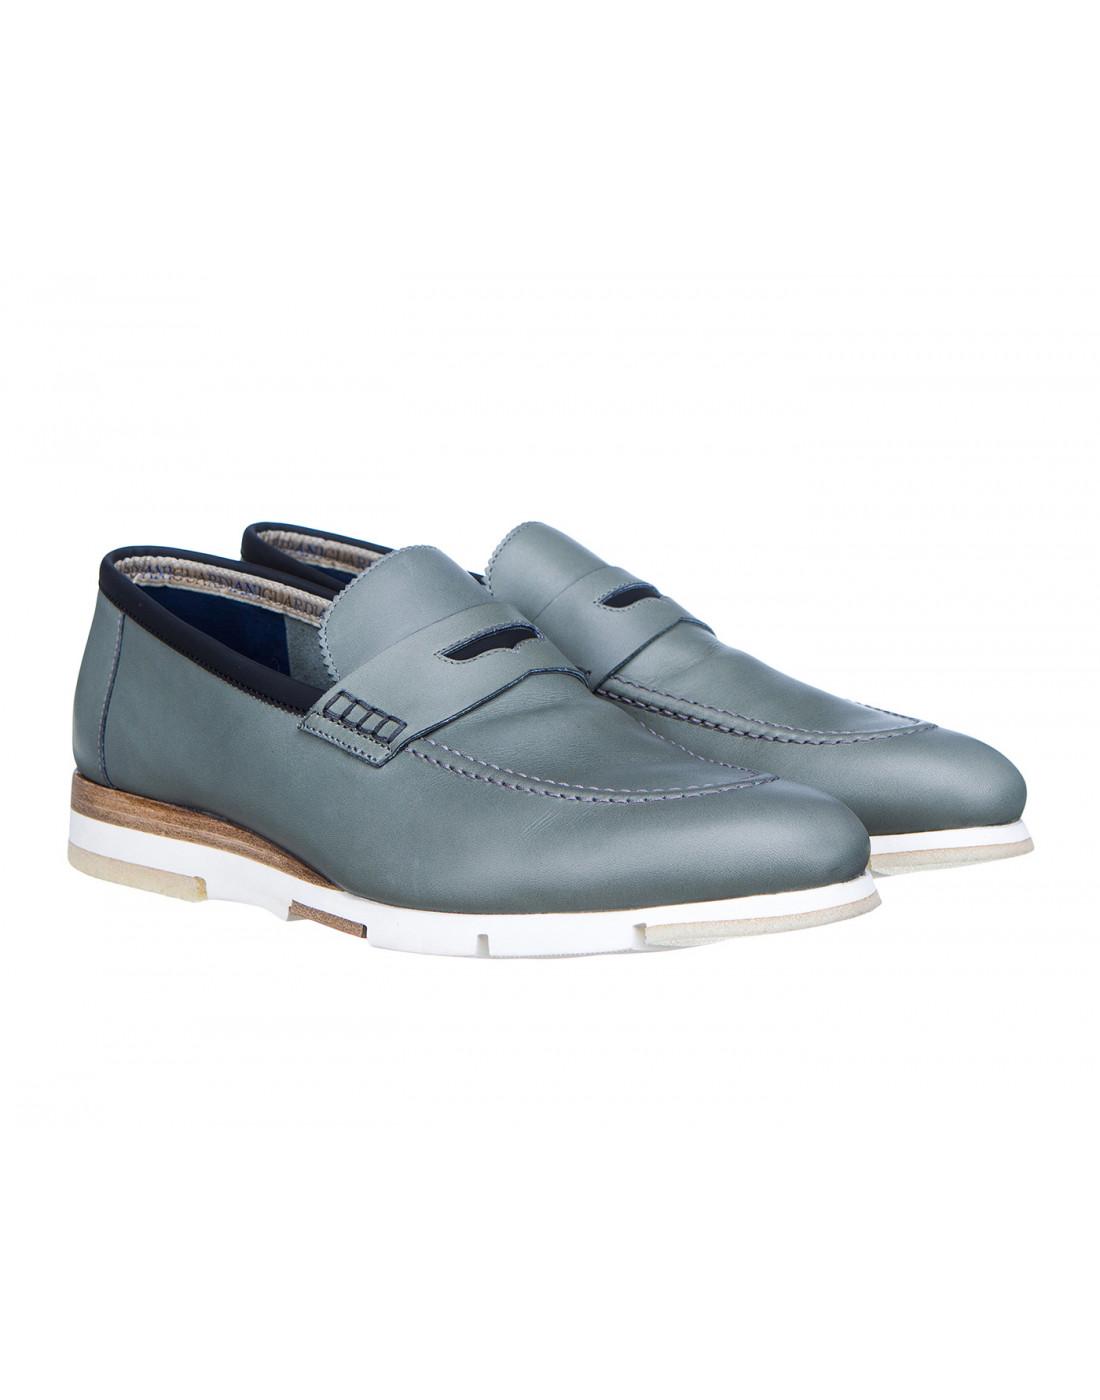 Туфли серые мужские A.Guardiani S76032S-2